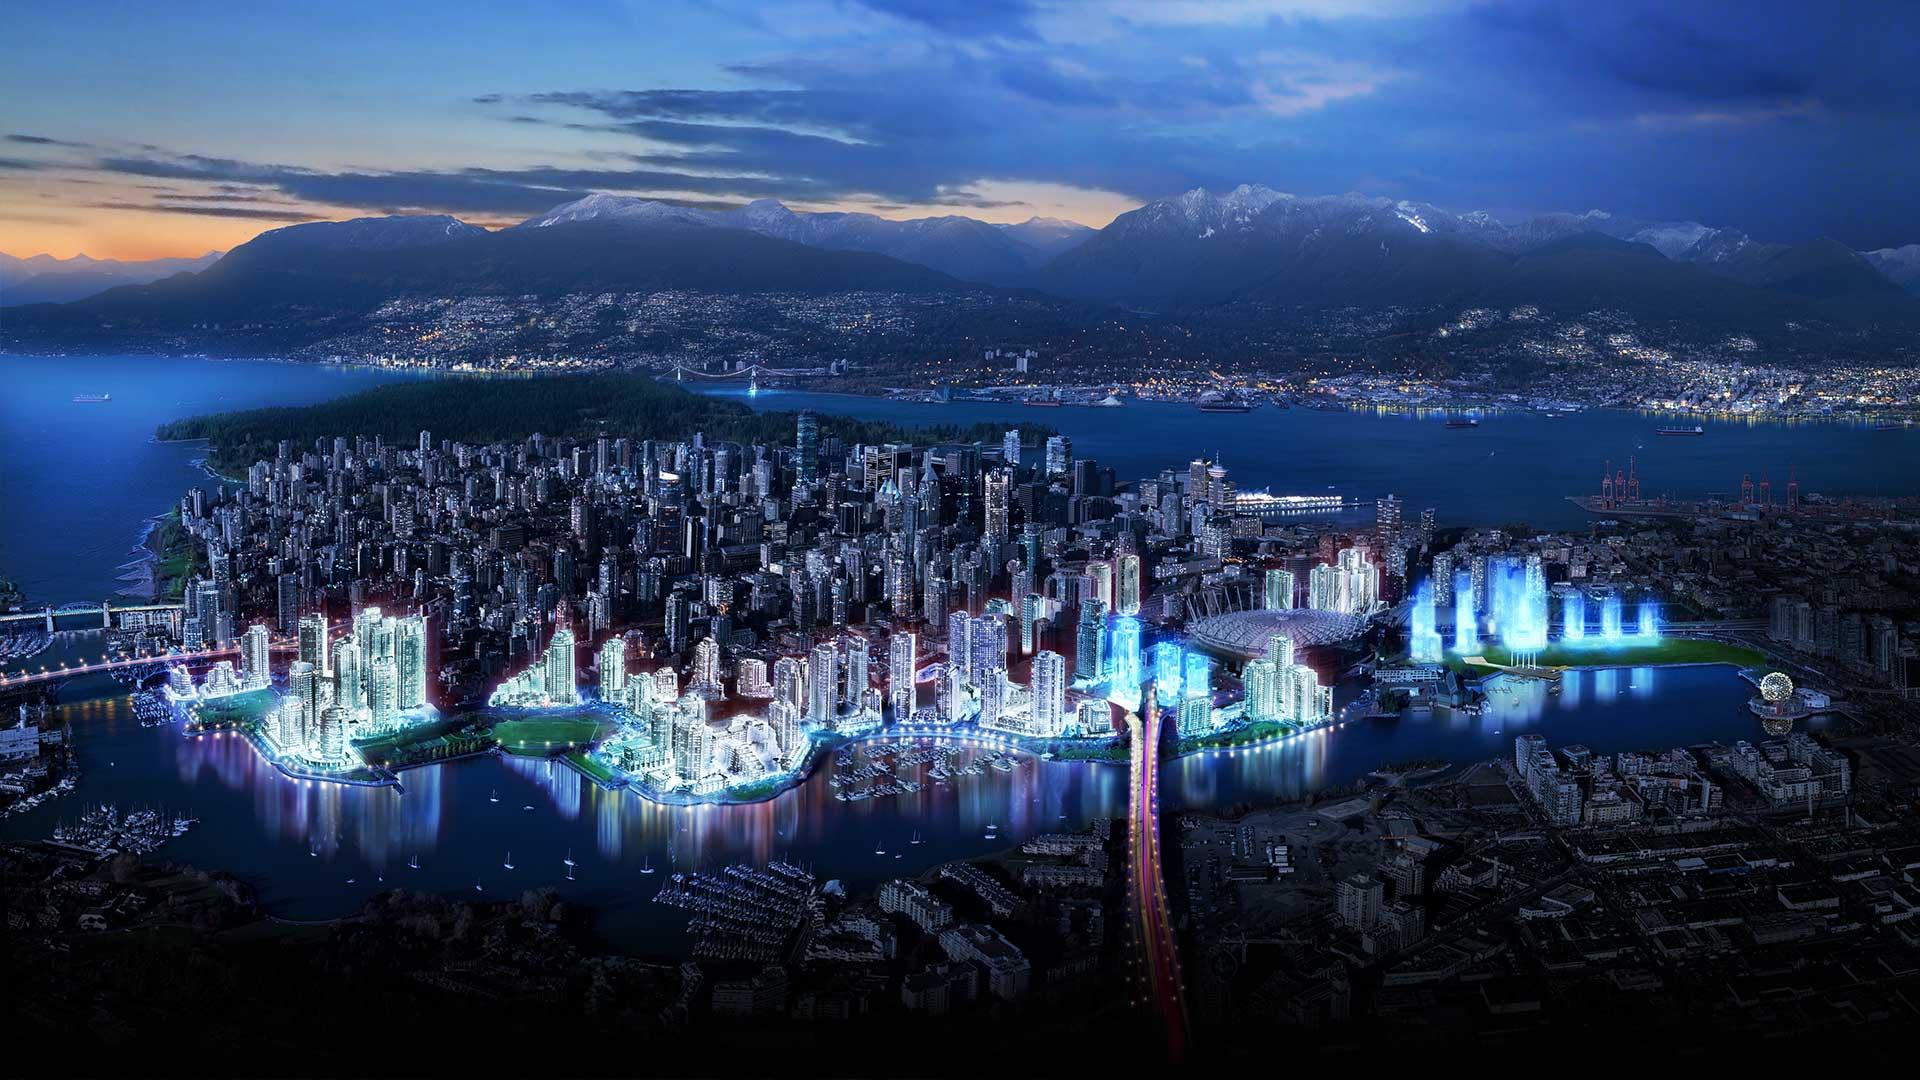 Vancouver Wallpaper 1920x1080 65896